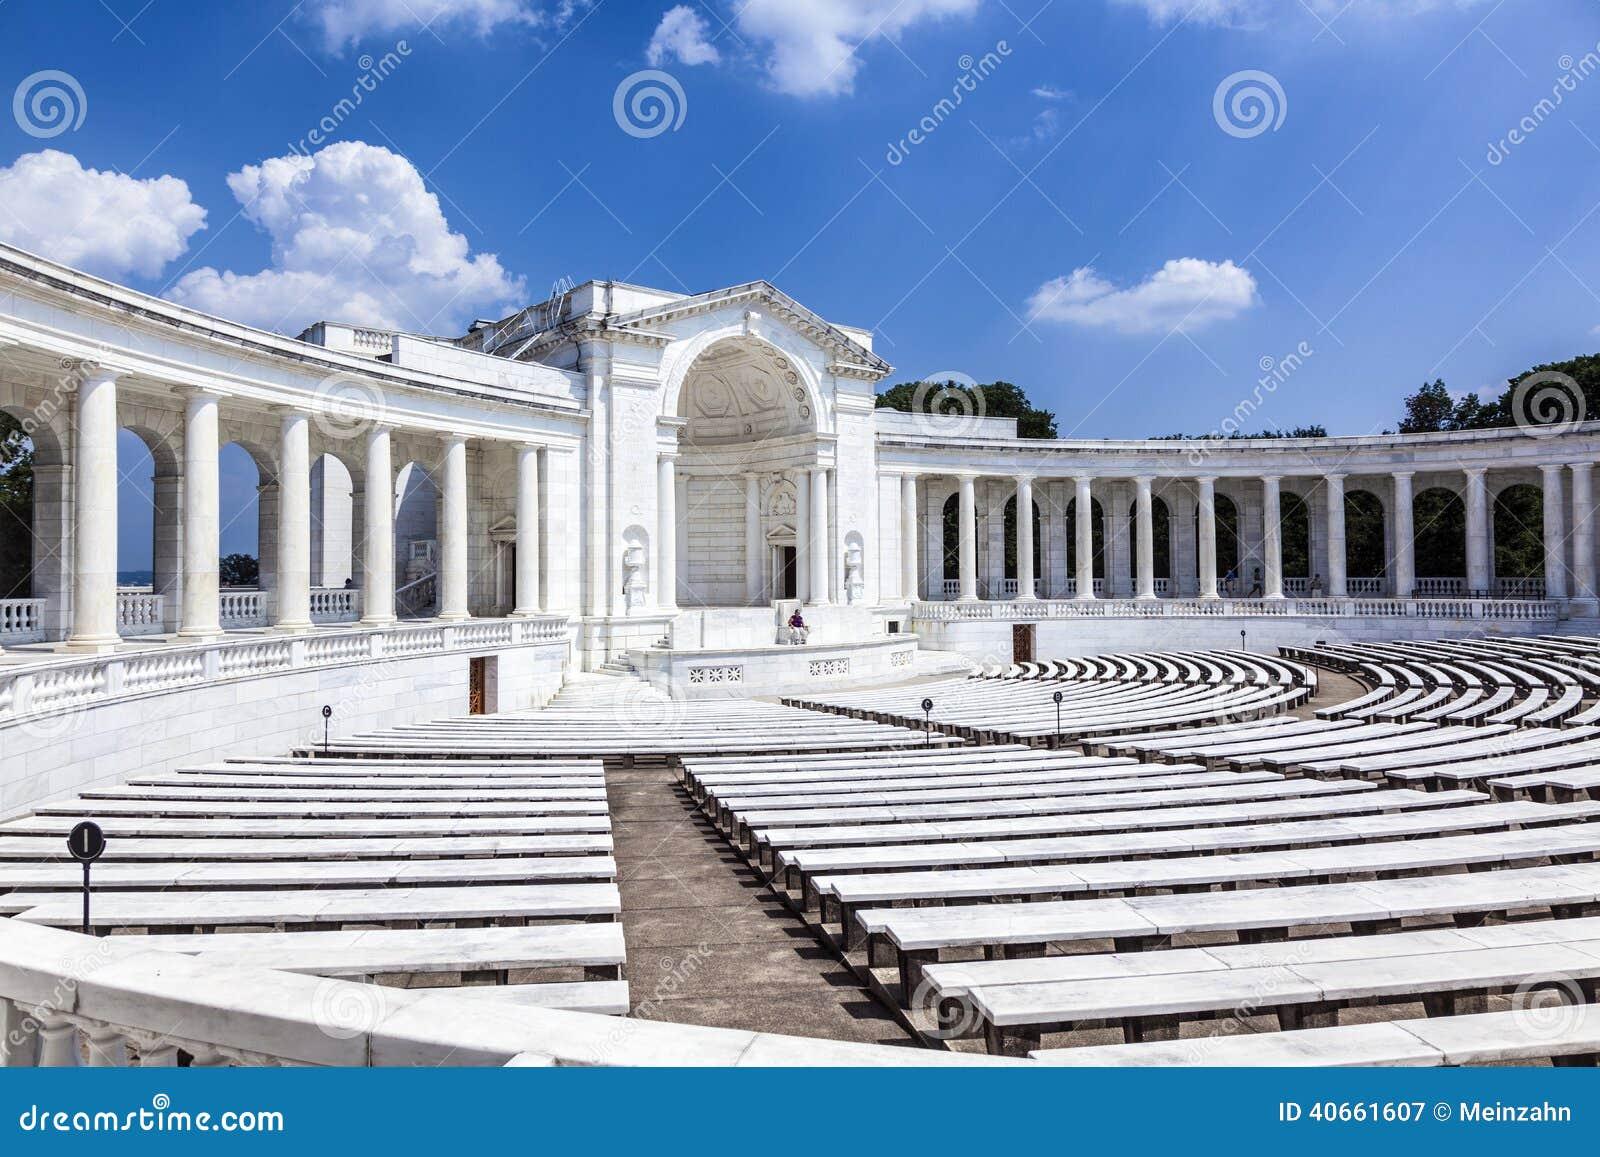 Erinnerungsamphitheater in Arlington